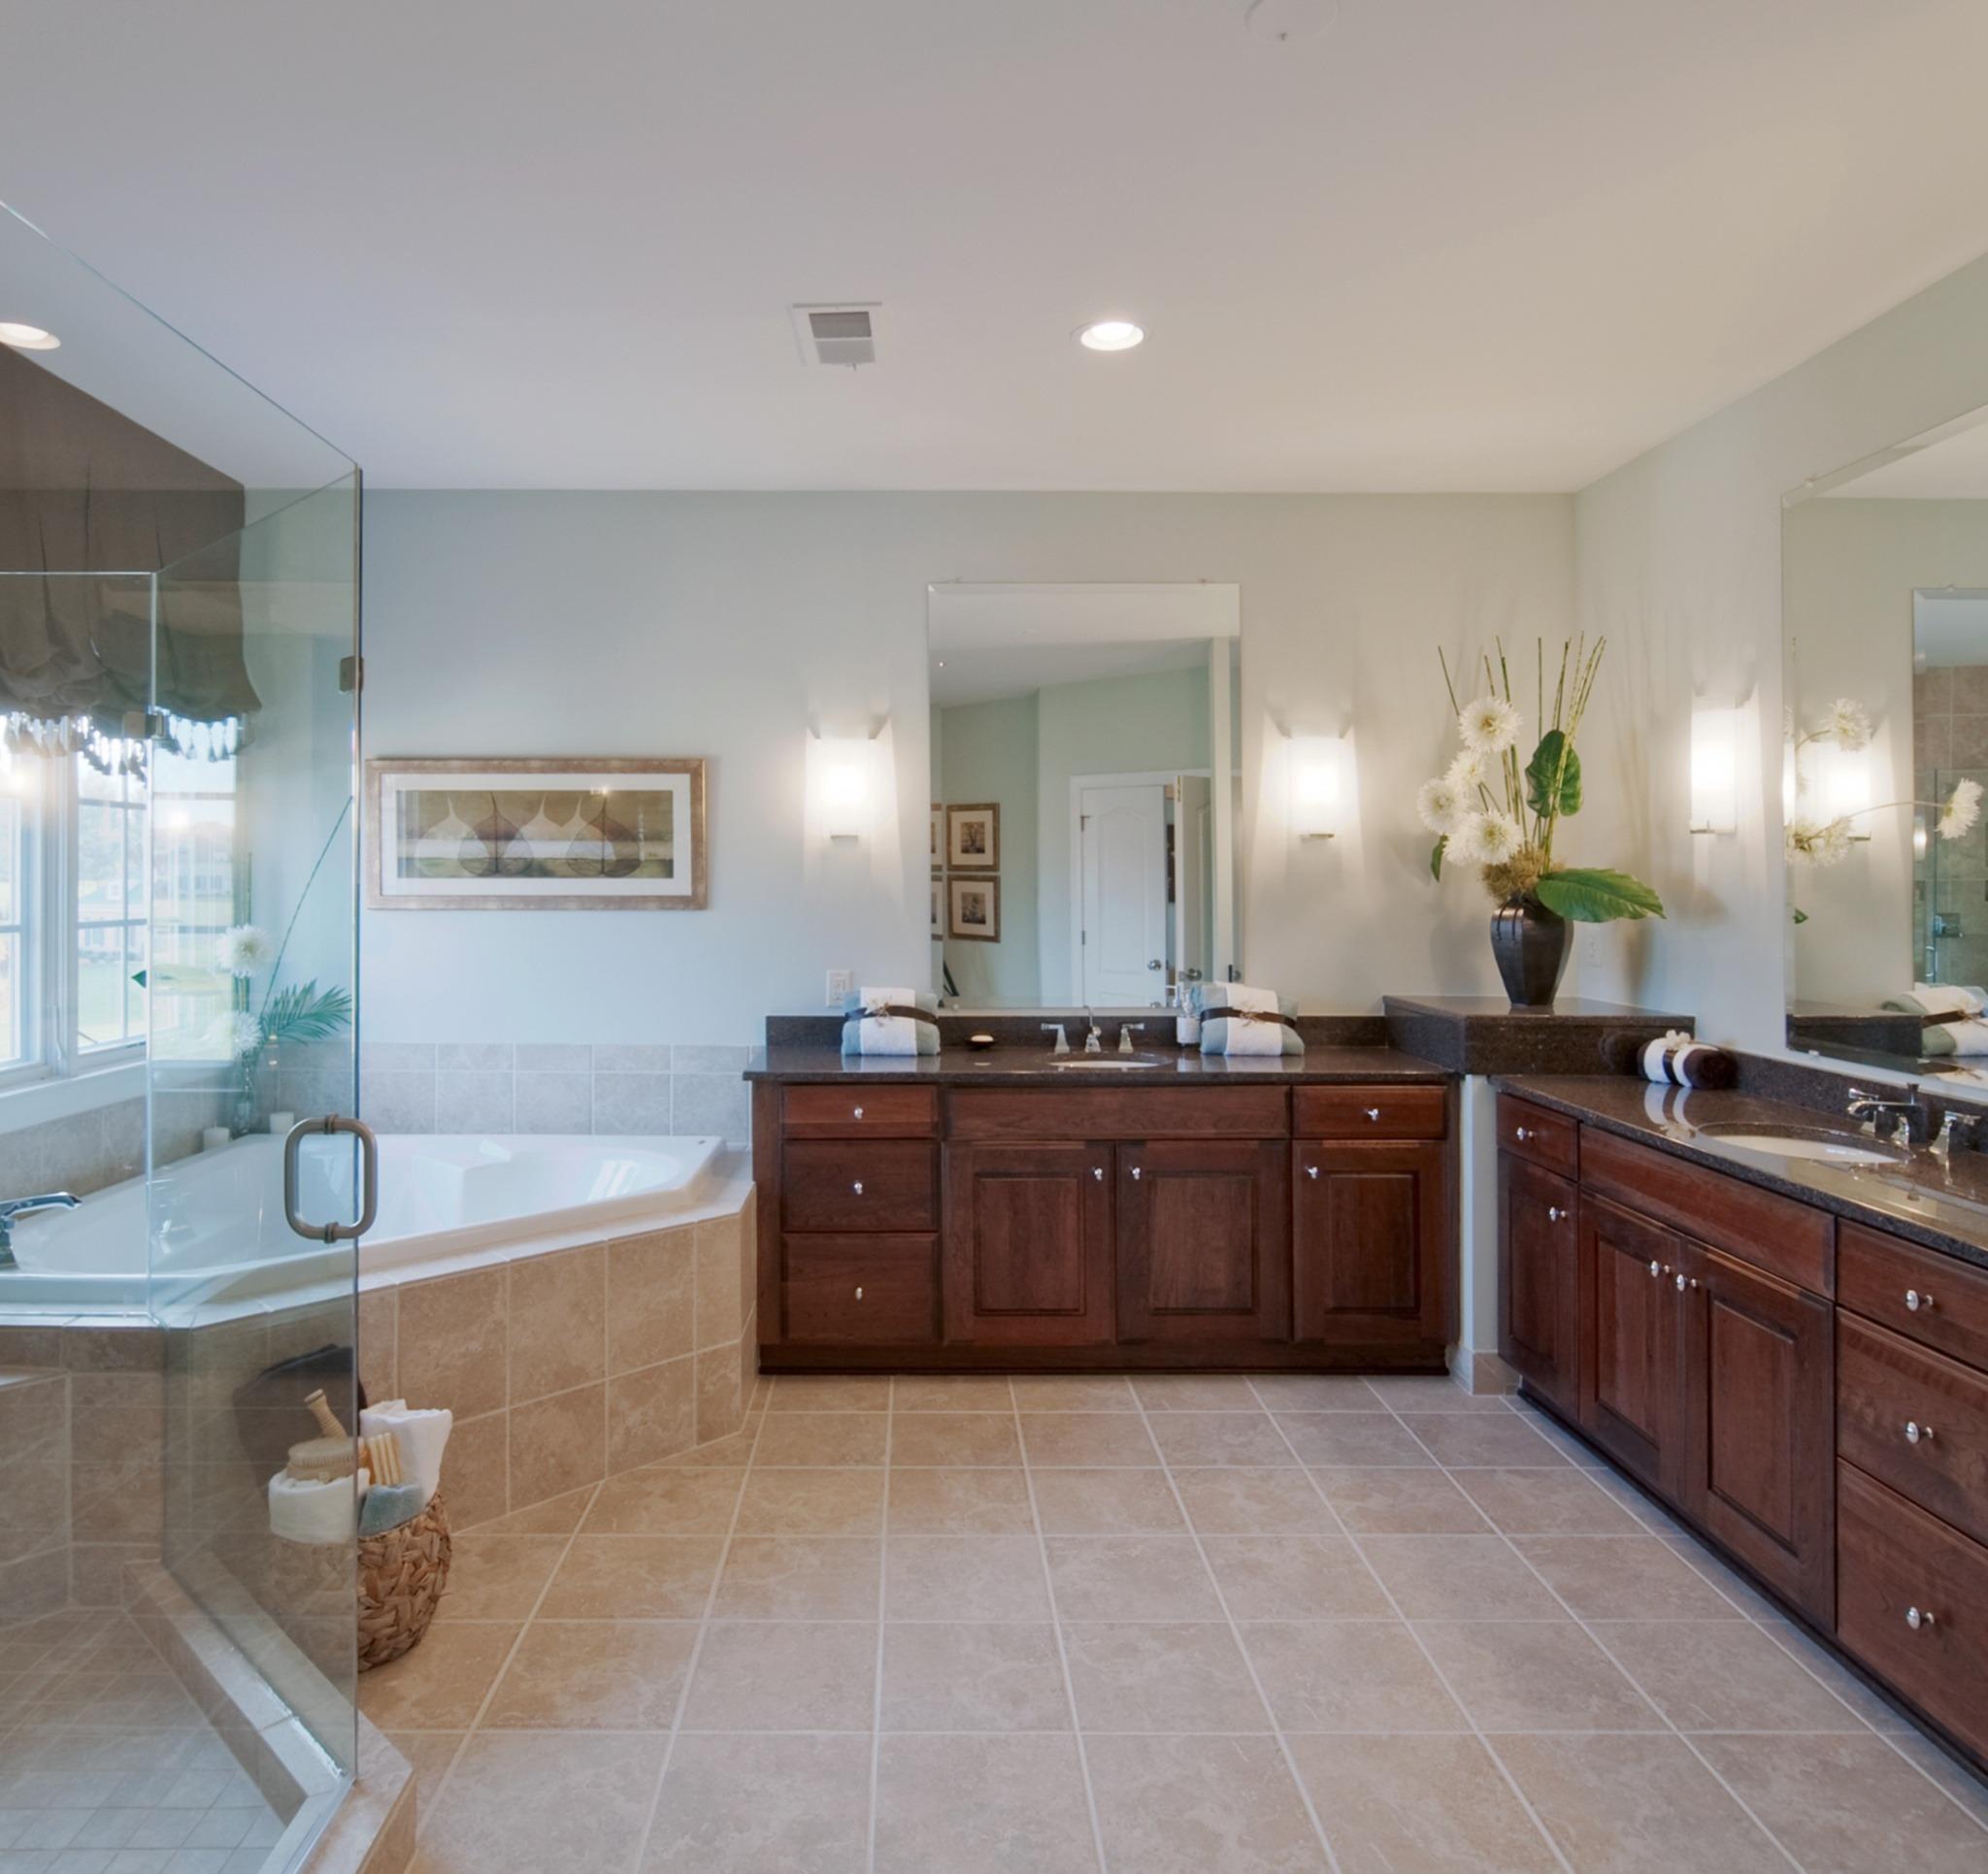 Grovemont Winthrop - Owner's Bath